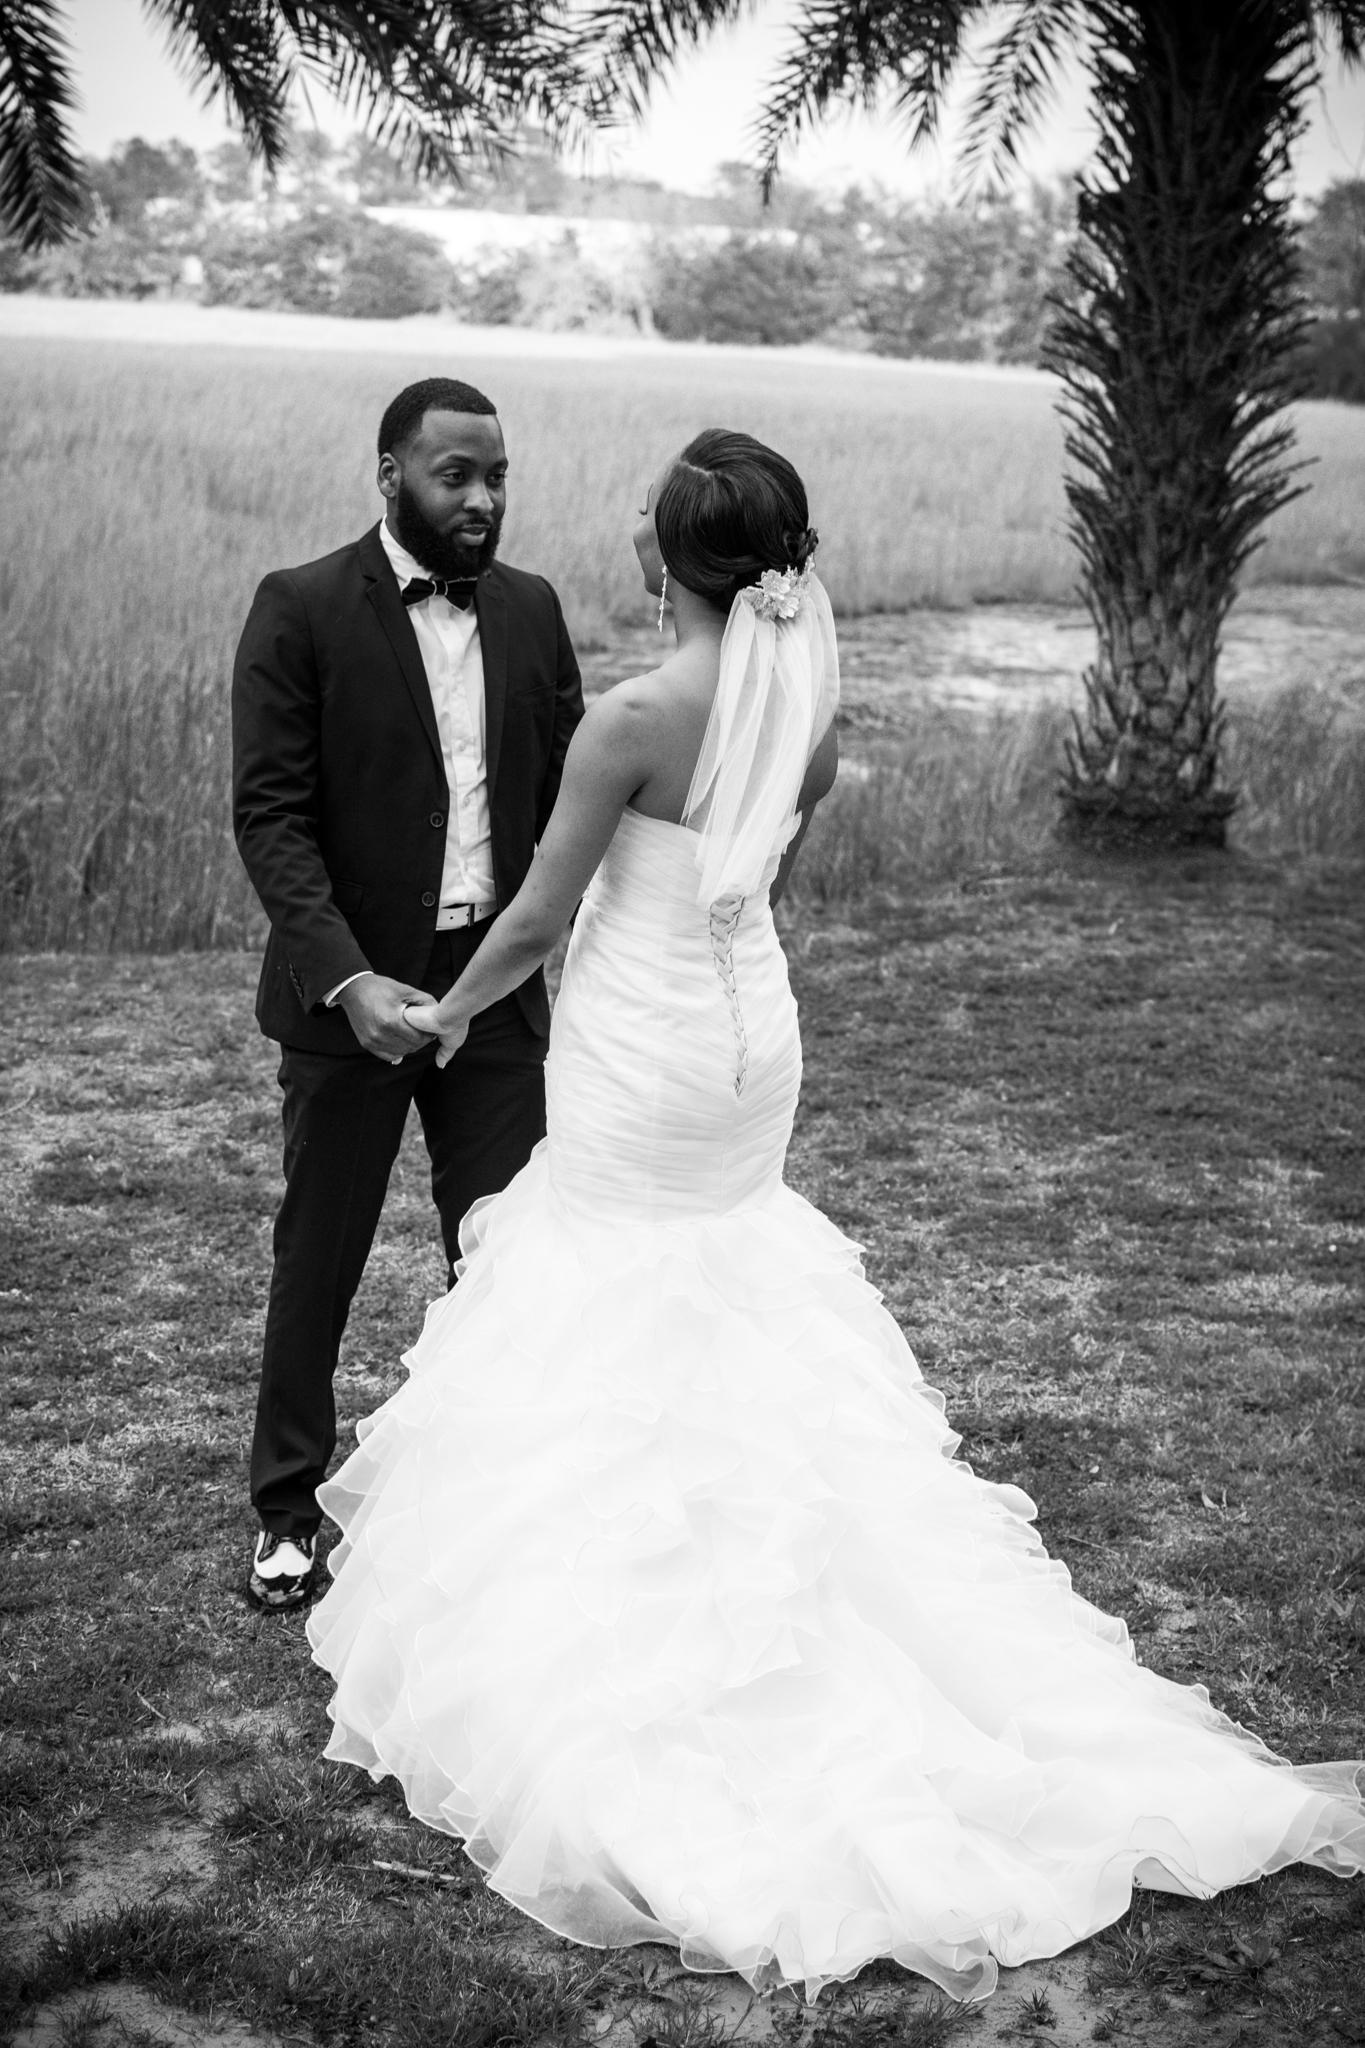 chaplin wedding (52 of 181).JPG